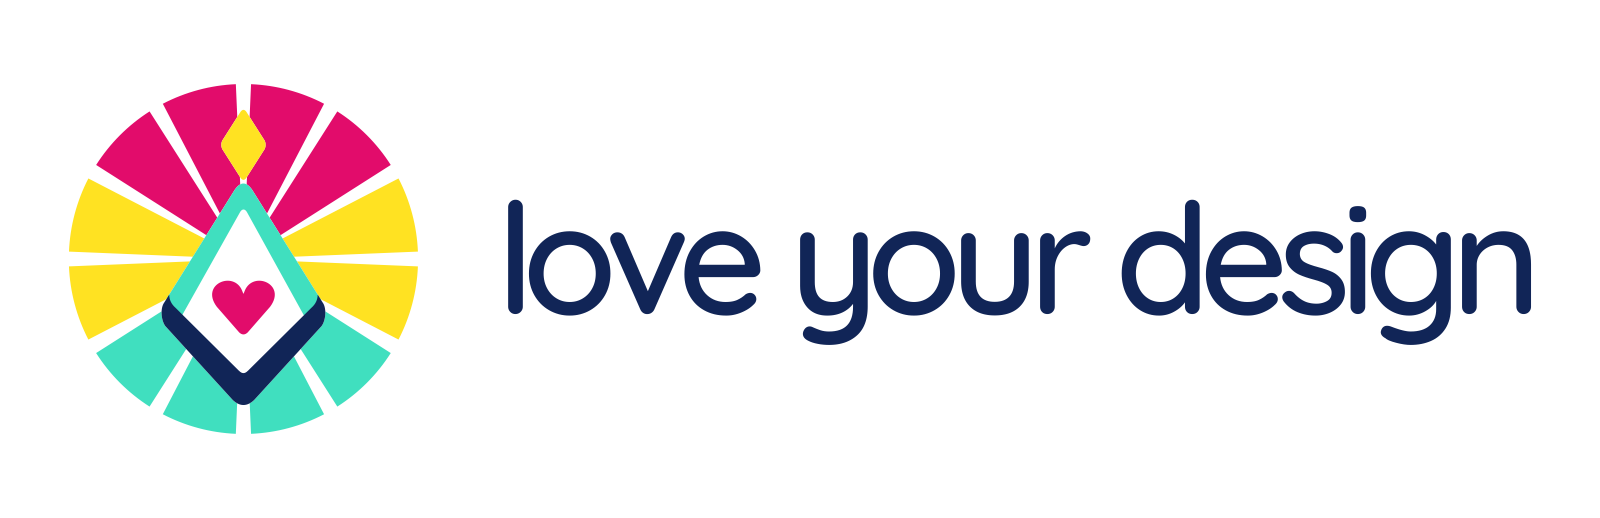 loveyourdesign.com